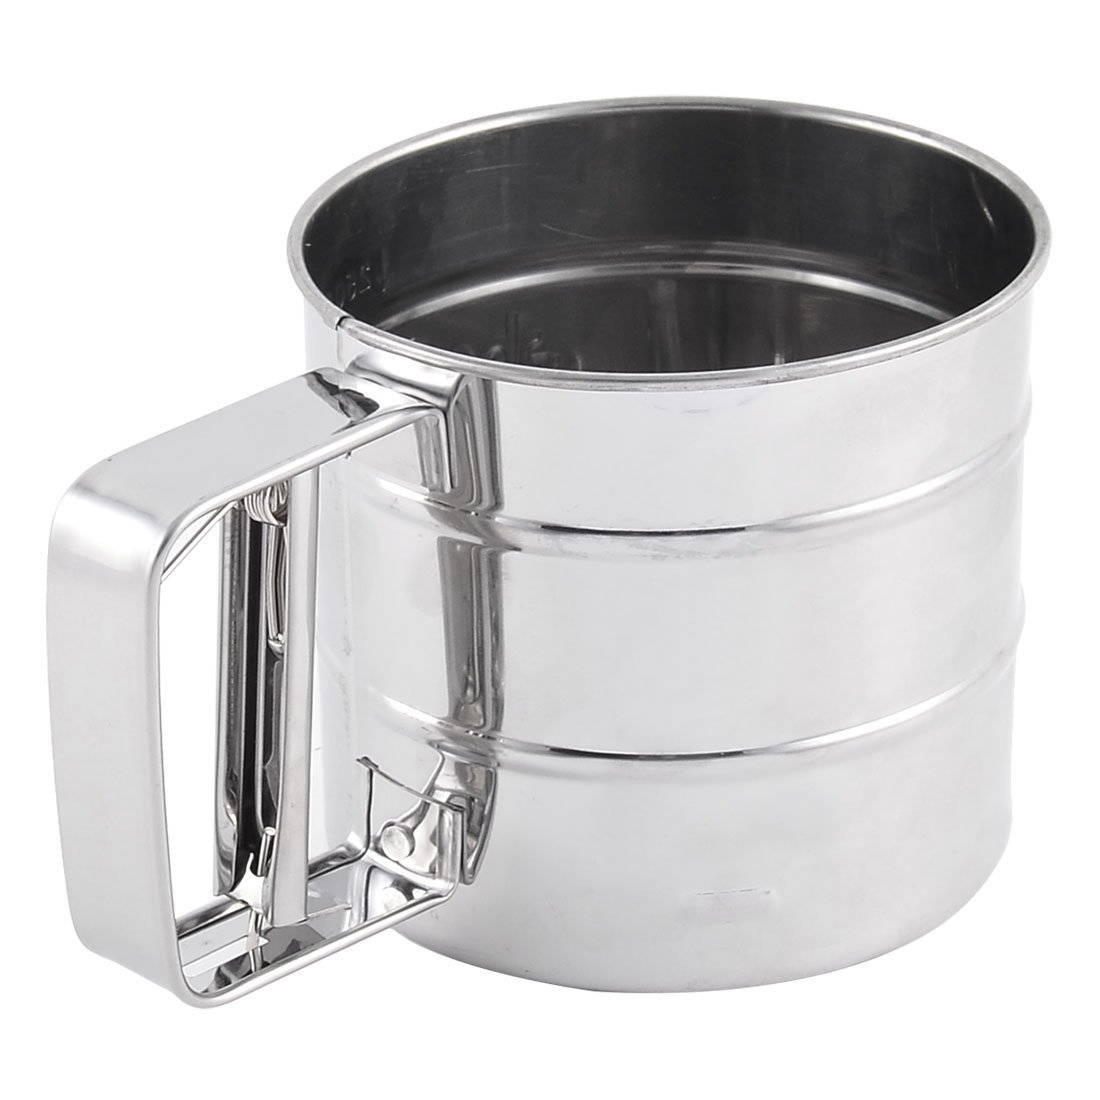 Aço inoxidável DealMux Home Kitchen Baking Farinha Açúcar malha Sifter Shaker tom de prata